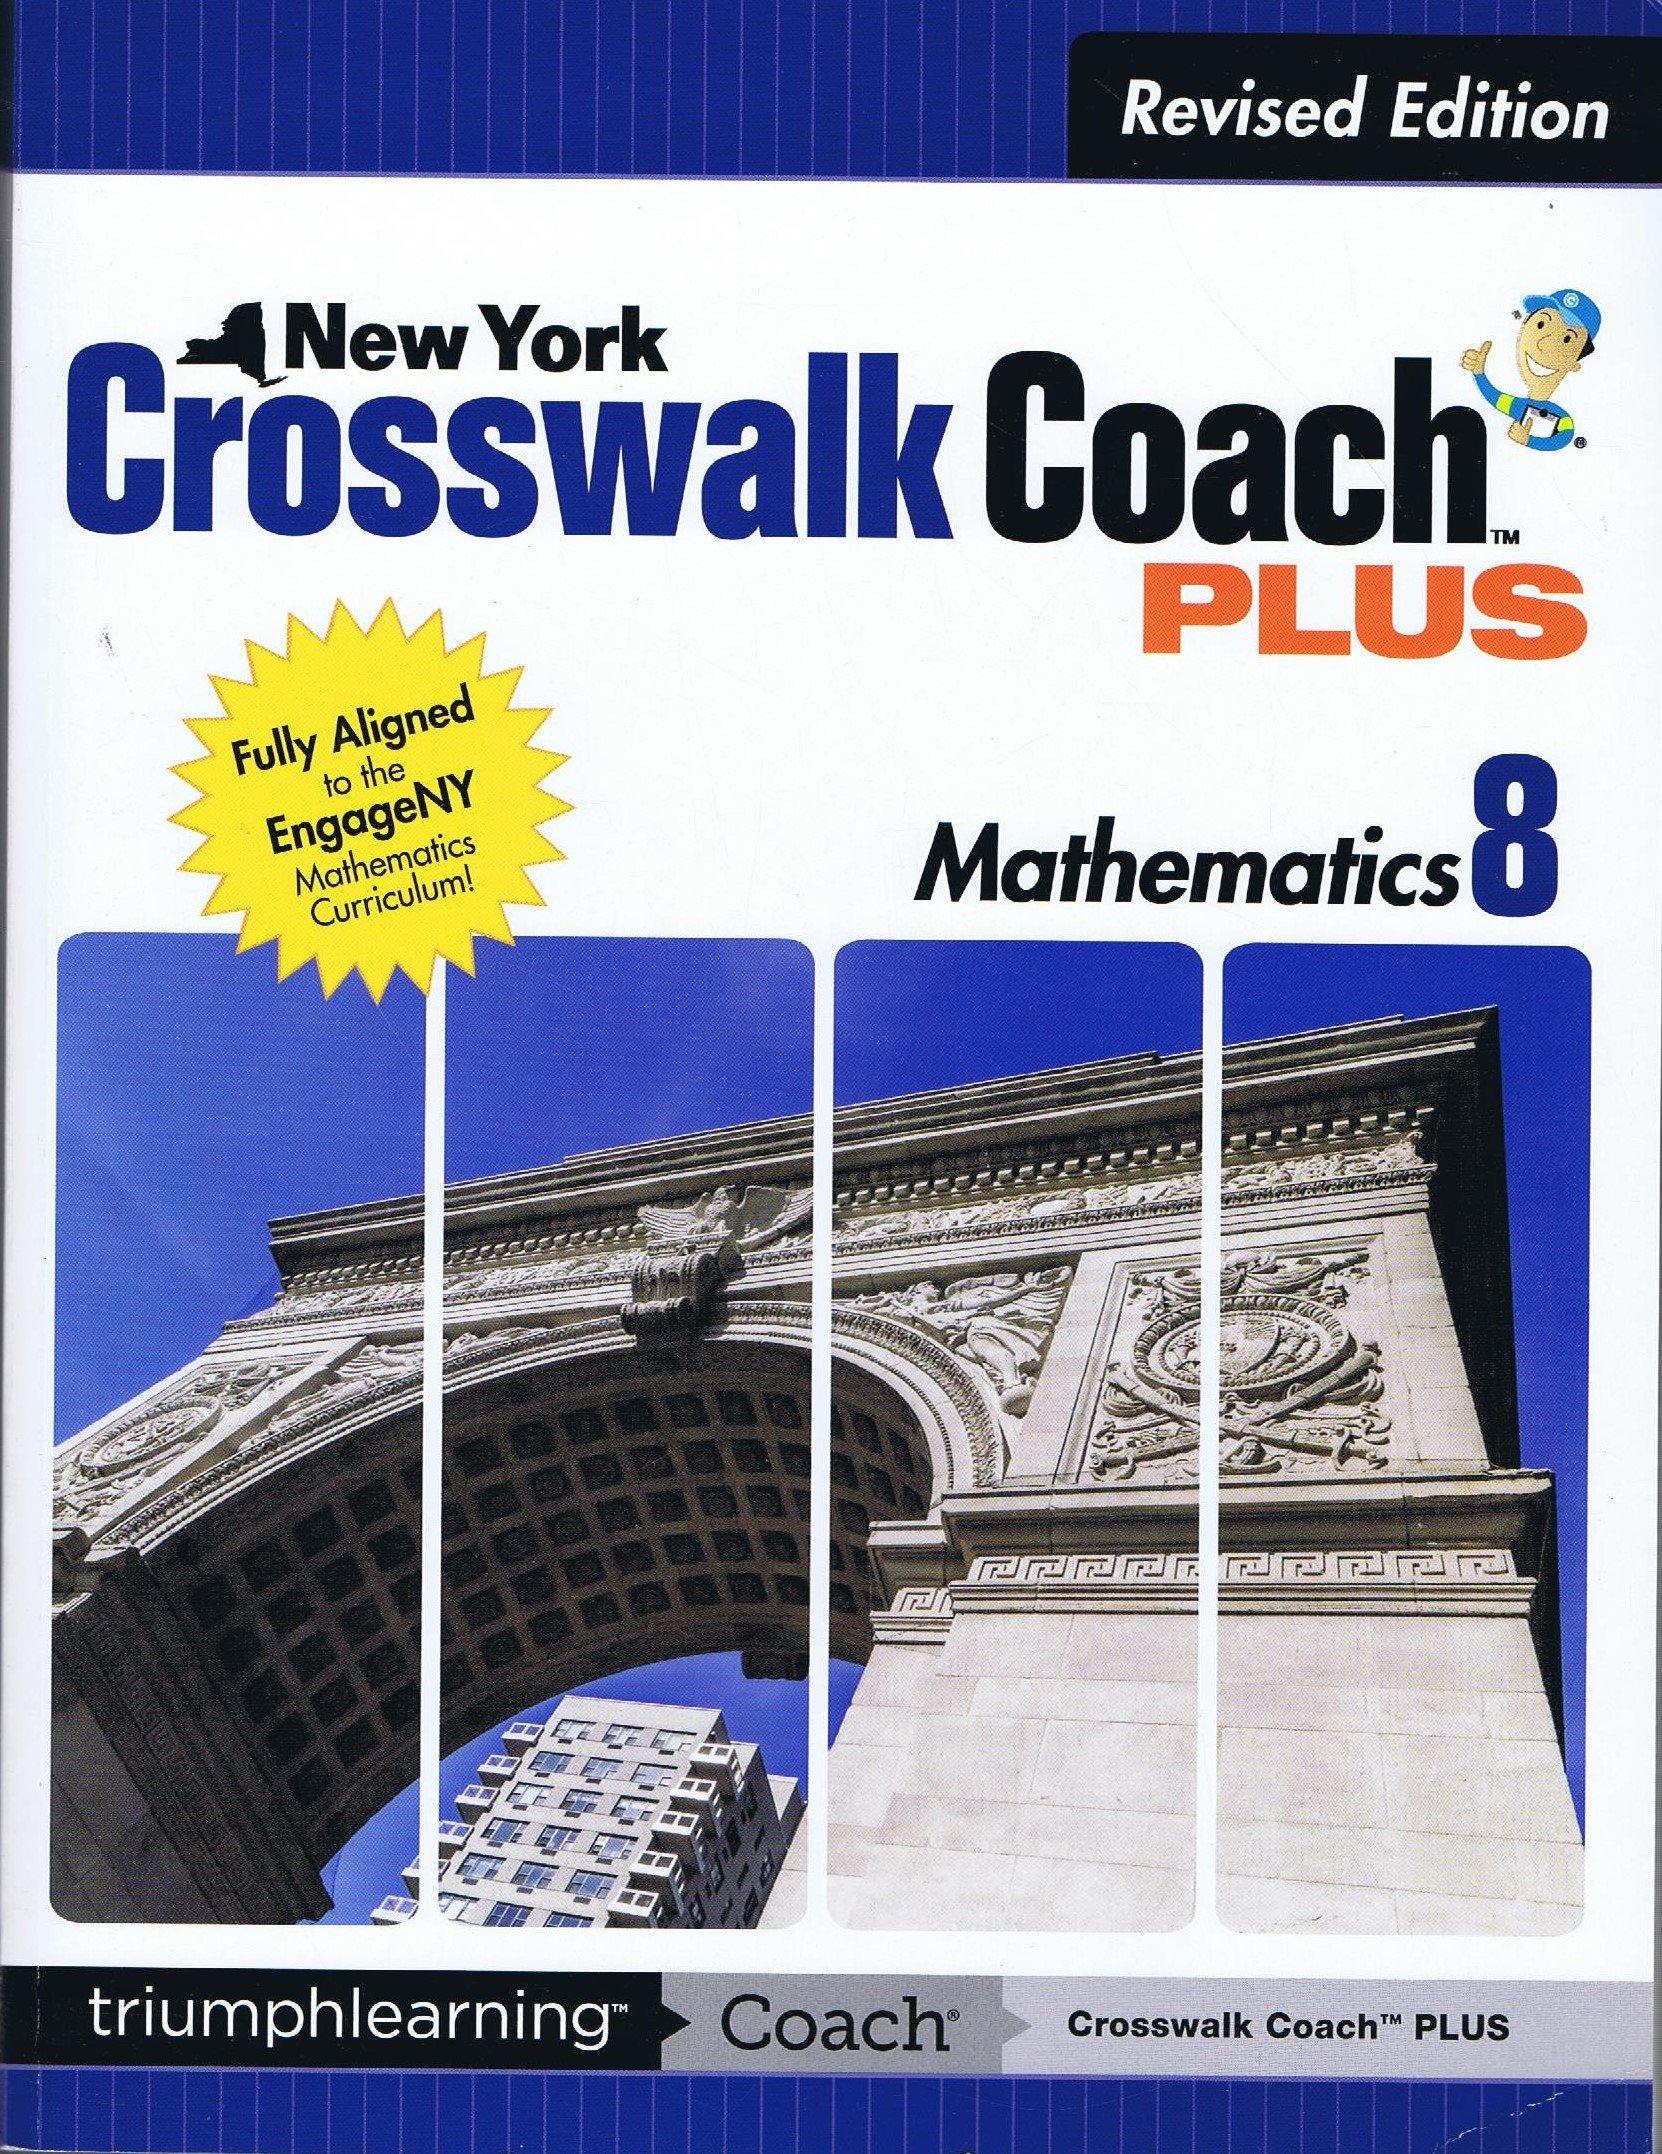 New York Crosswalk Coach PLUS Grade 8 Math with Answer Key ebook